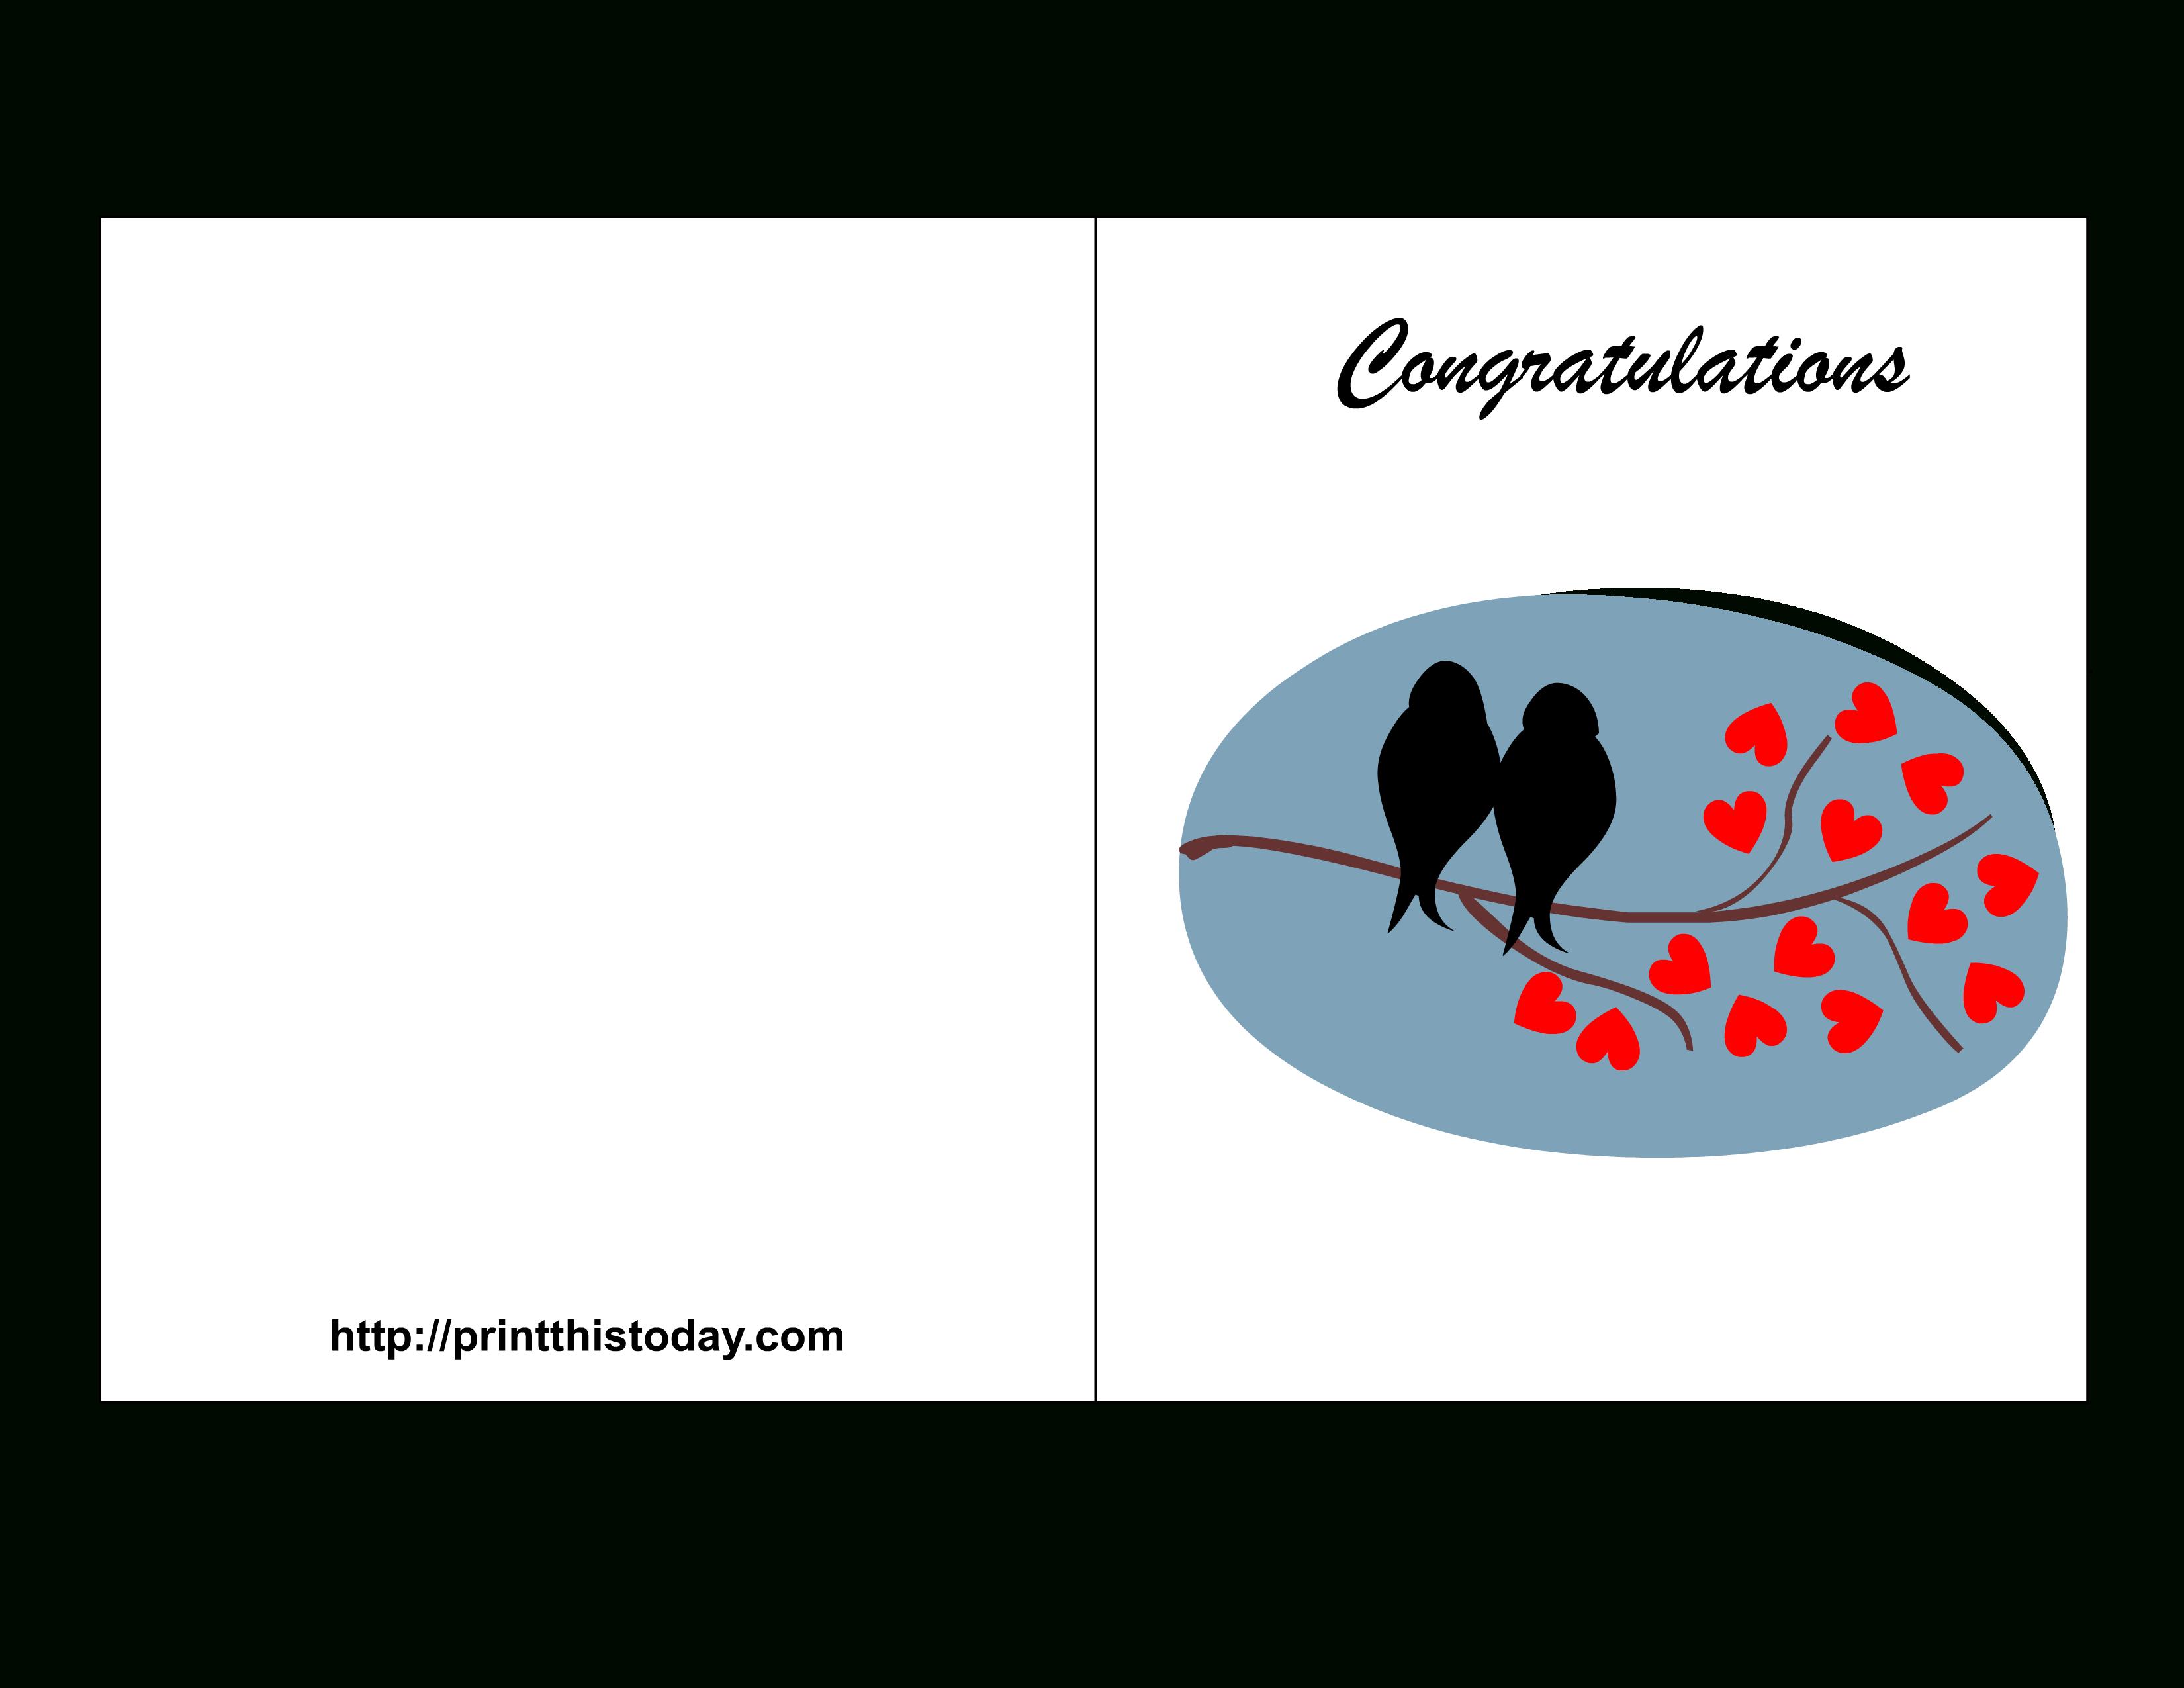 Free Printable Baby Congratulation Cards | Free Printable Wedding - Wedding Wish Cards Printable Free